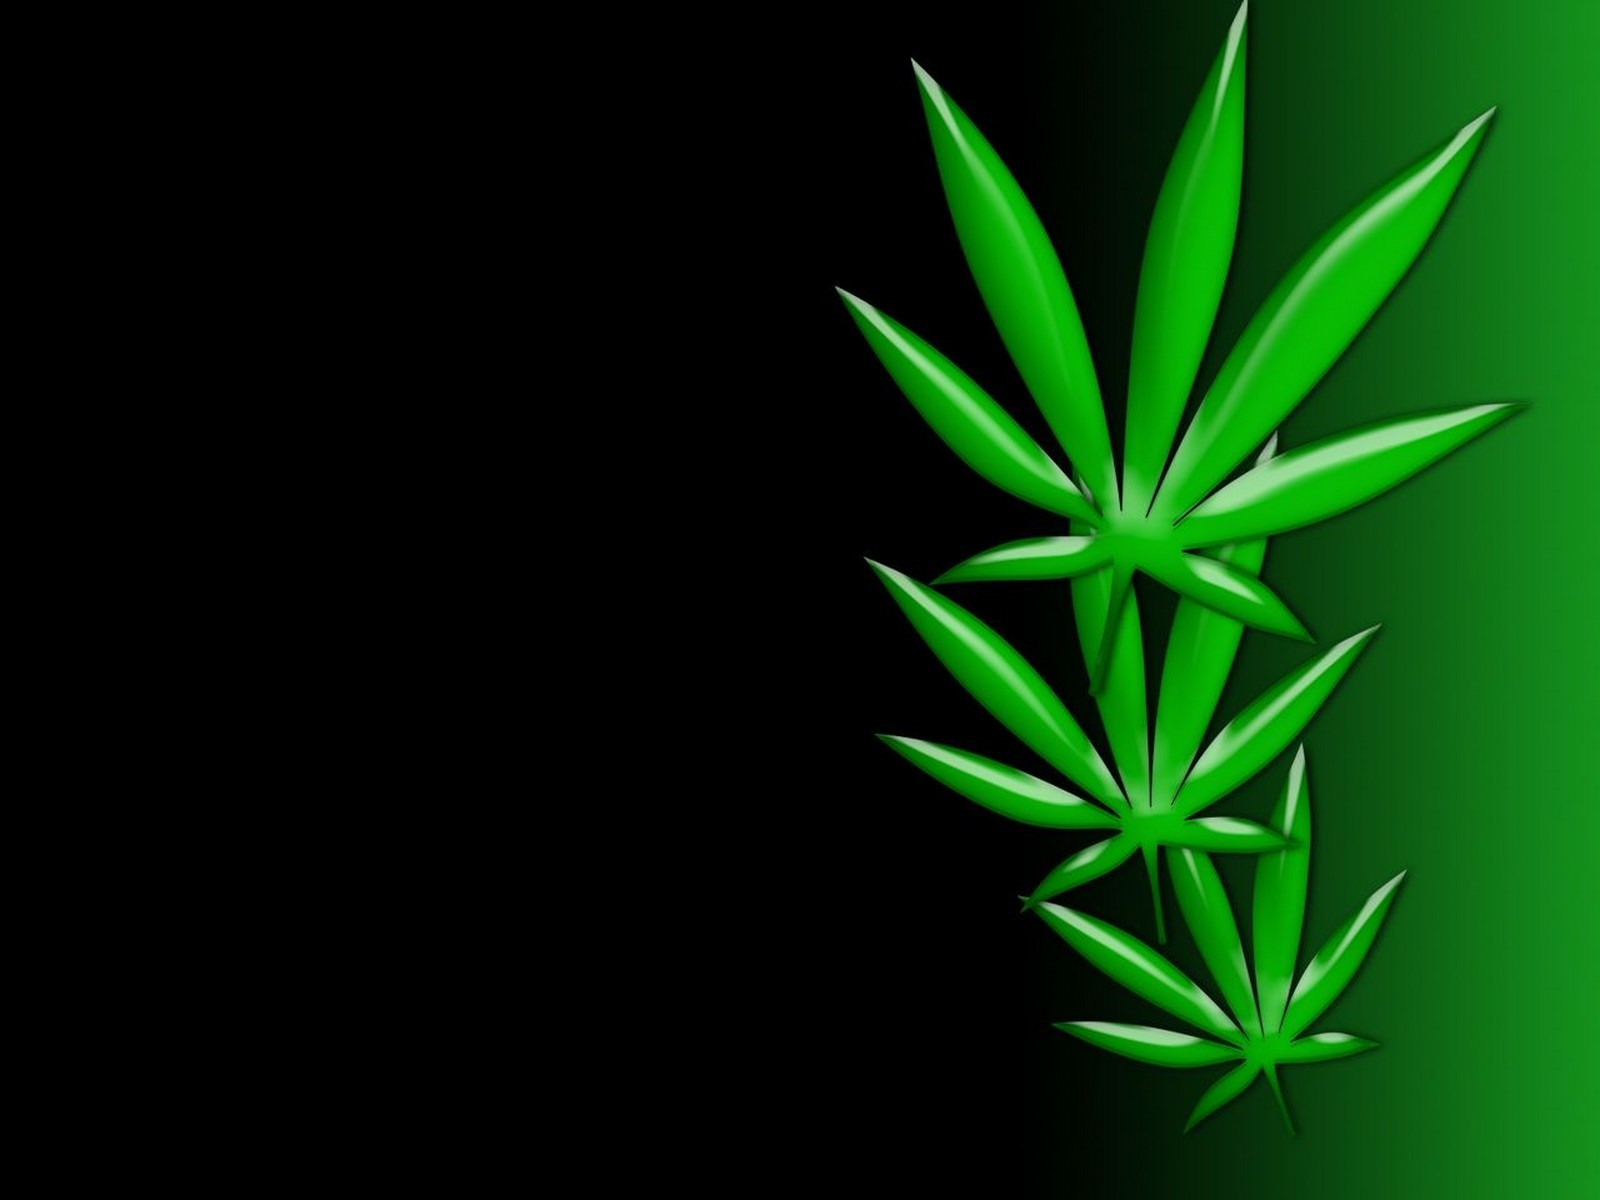 pot leaf wallpaper wallpapersafari marijuana leaf background pattern marijuana leaf transparent background